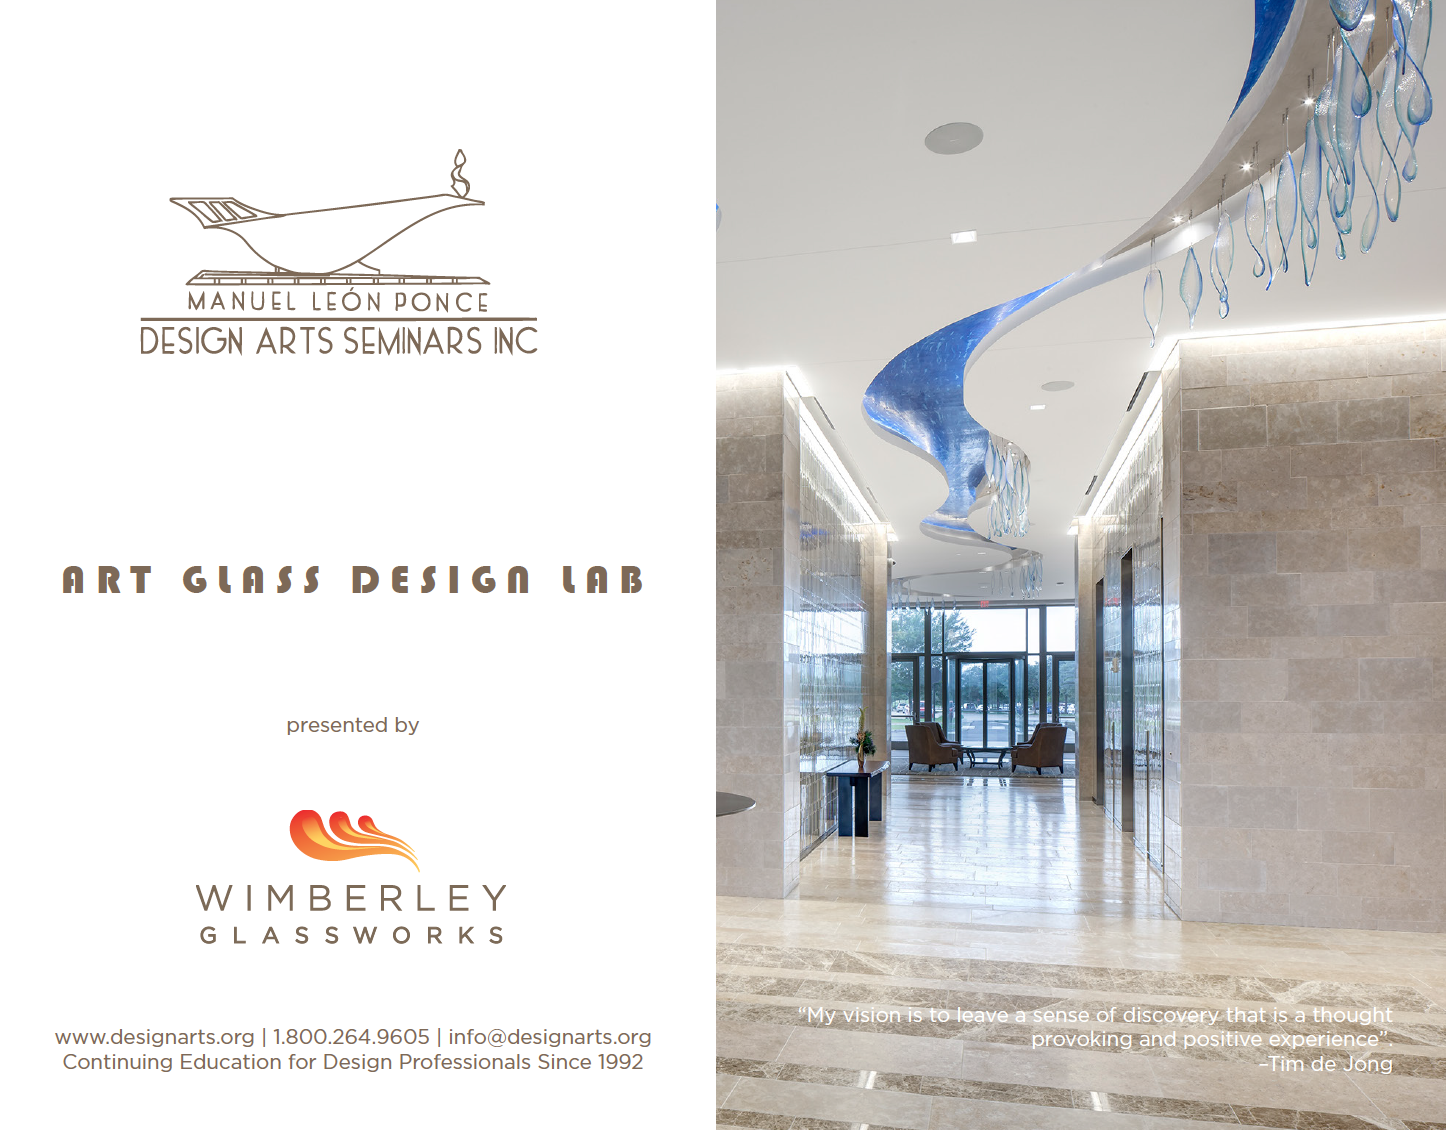 Art Glass Design Lab